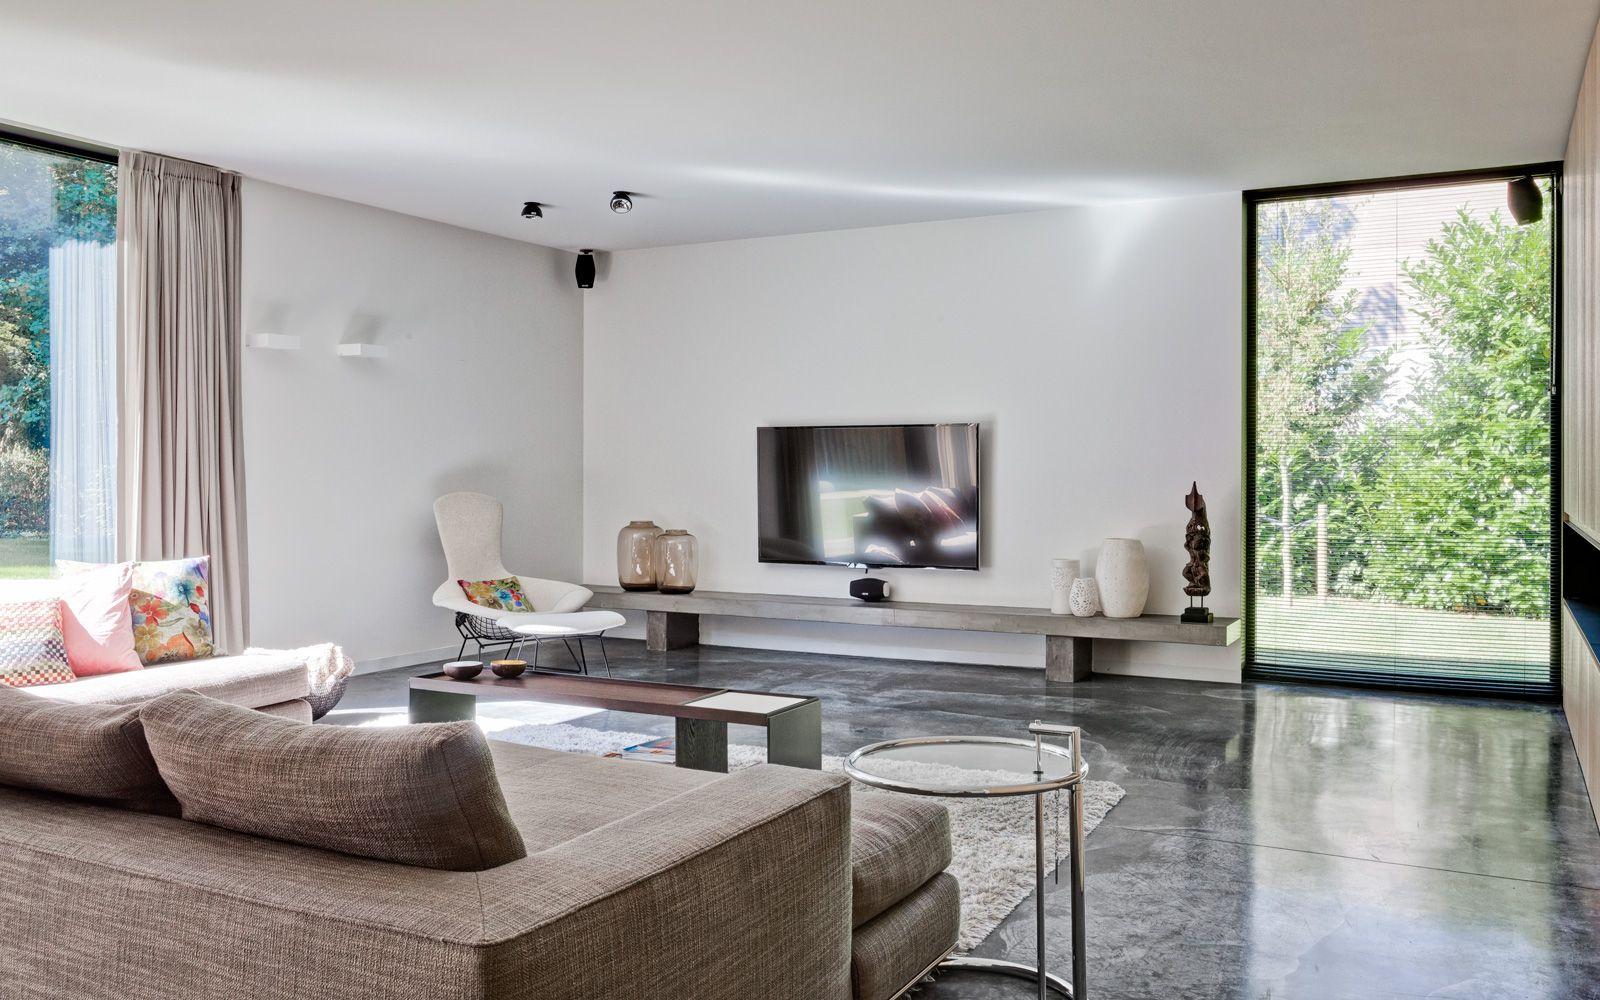 Metamorfose traditionele woning - Villa\'s | Pinterest - Woonkamer ...